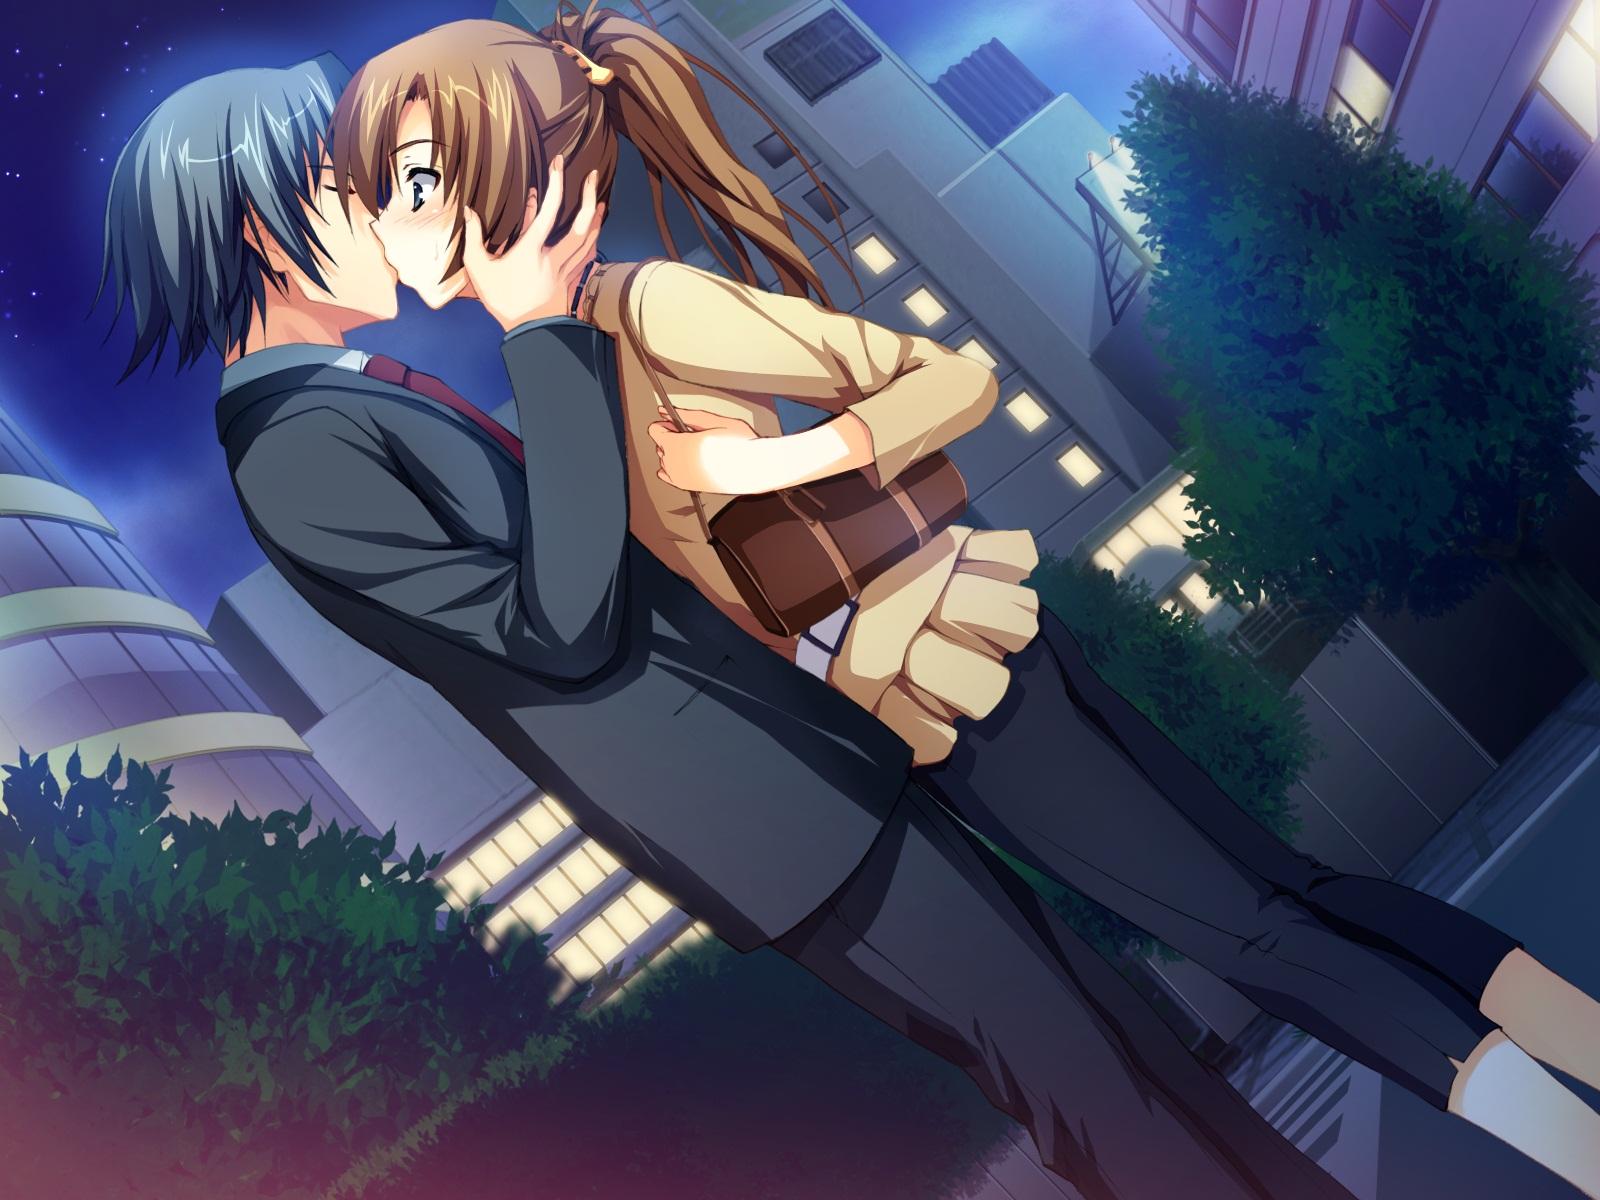 Аниме любовь романтика картинки 4